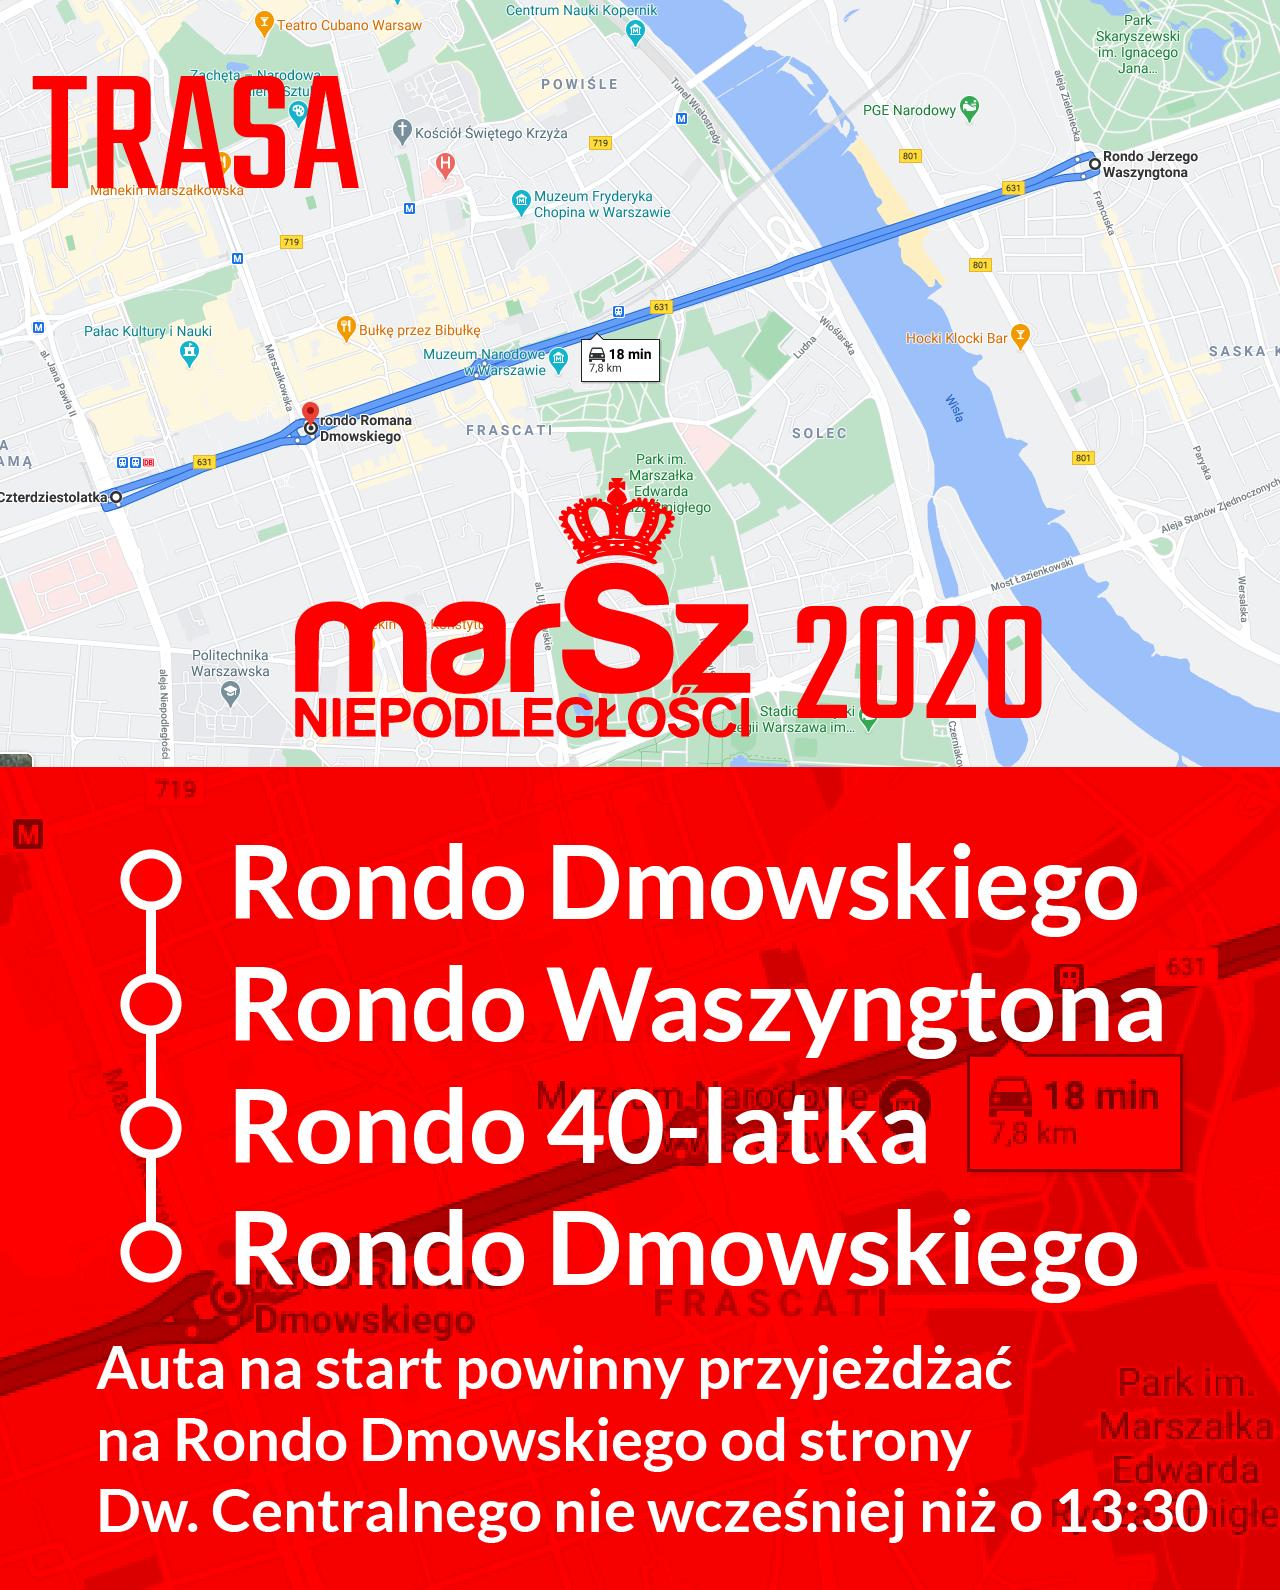 TRASA MARSZU: https://marszniepodleglosci.pl/wp-content/uploads/2020/11/mapa-marsz_Obszar-roboczy-1.png